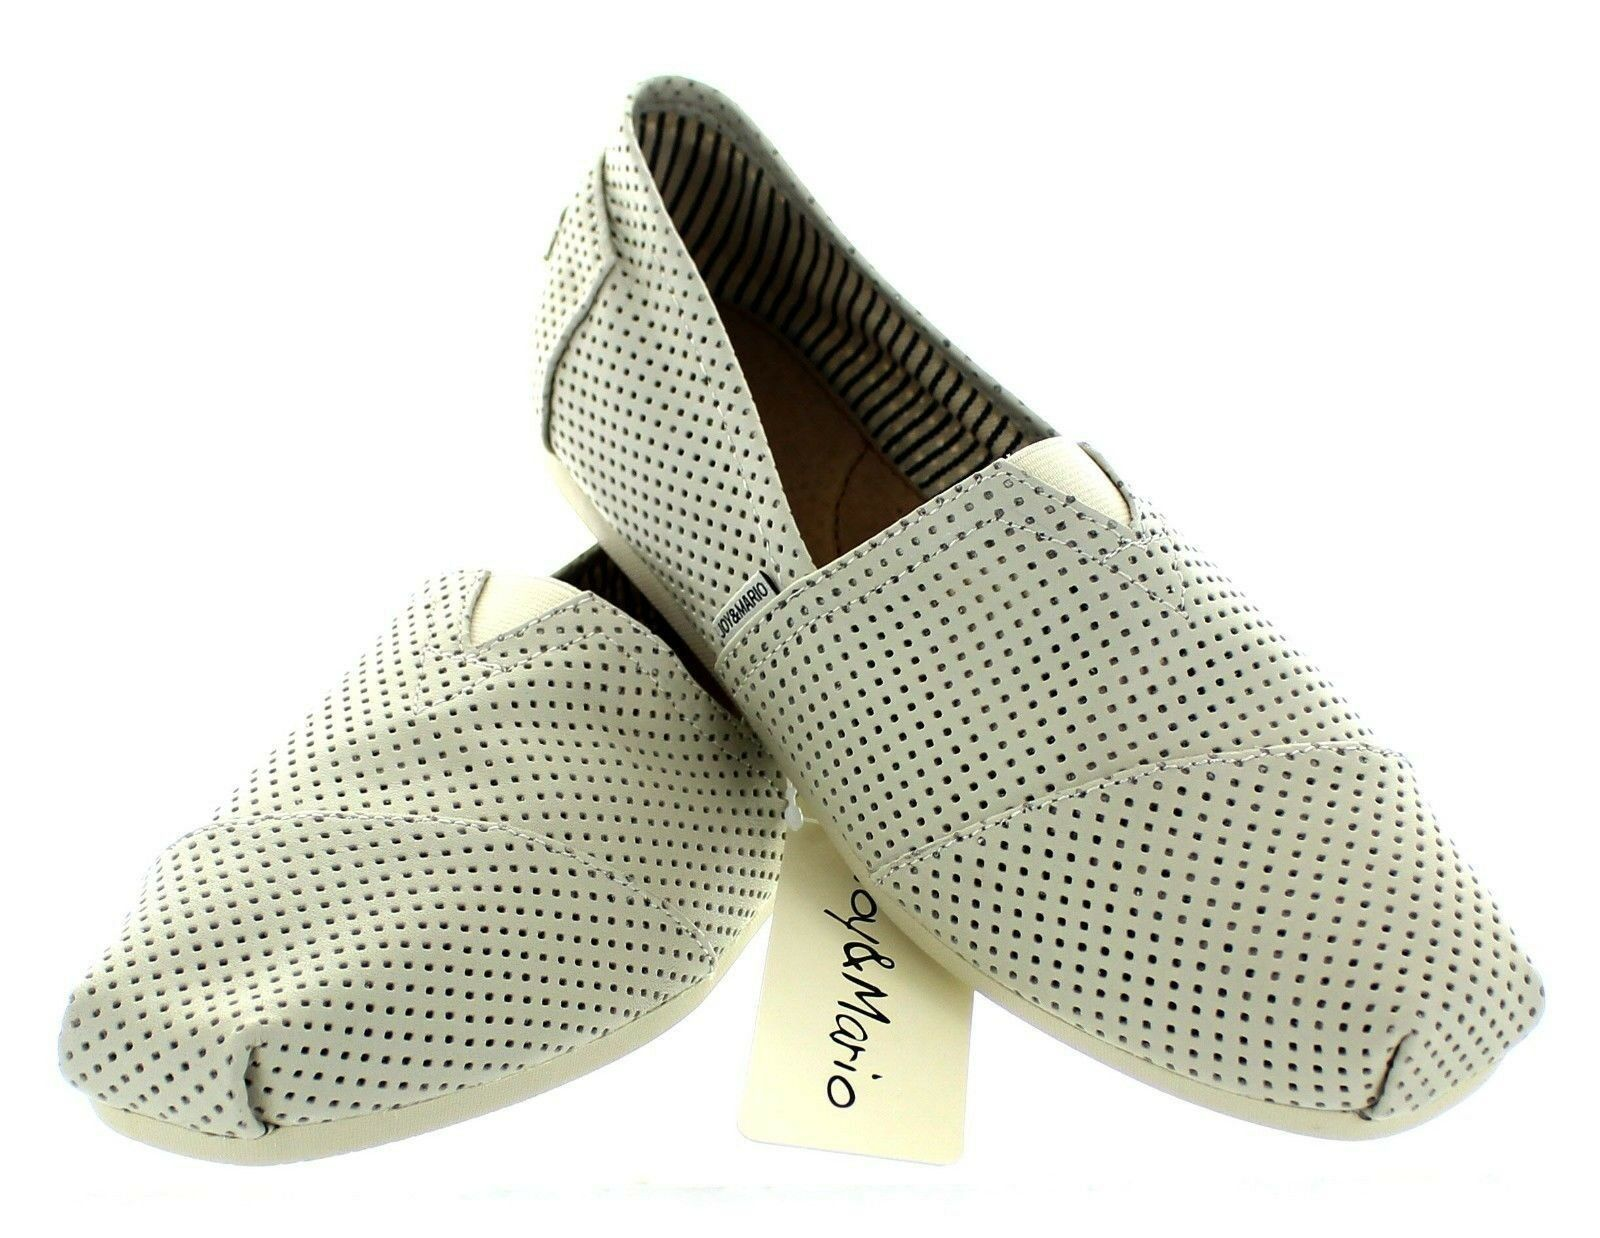 219dd216cb47fd Joy & Mario homme en cuir alpargatas Slip-On Mocassin Espadrille Plates  Chaussures Blanc